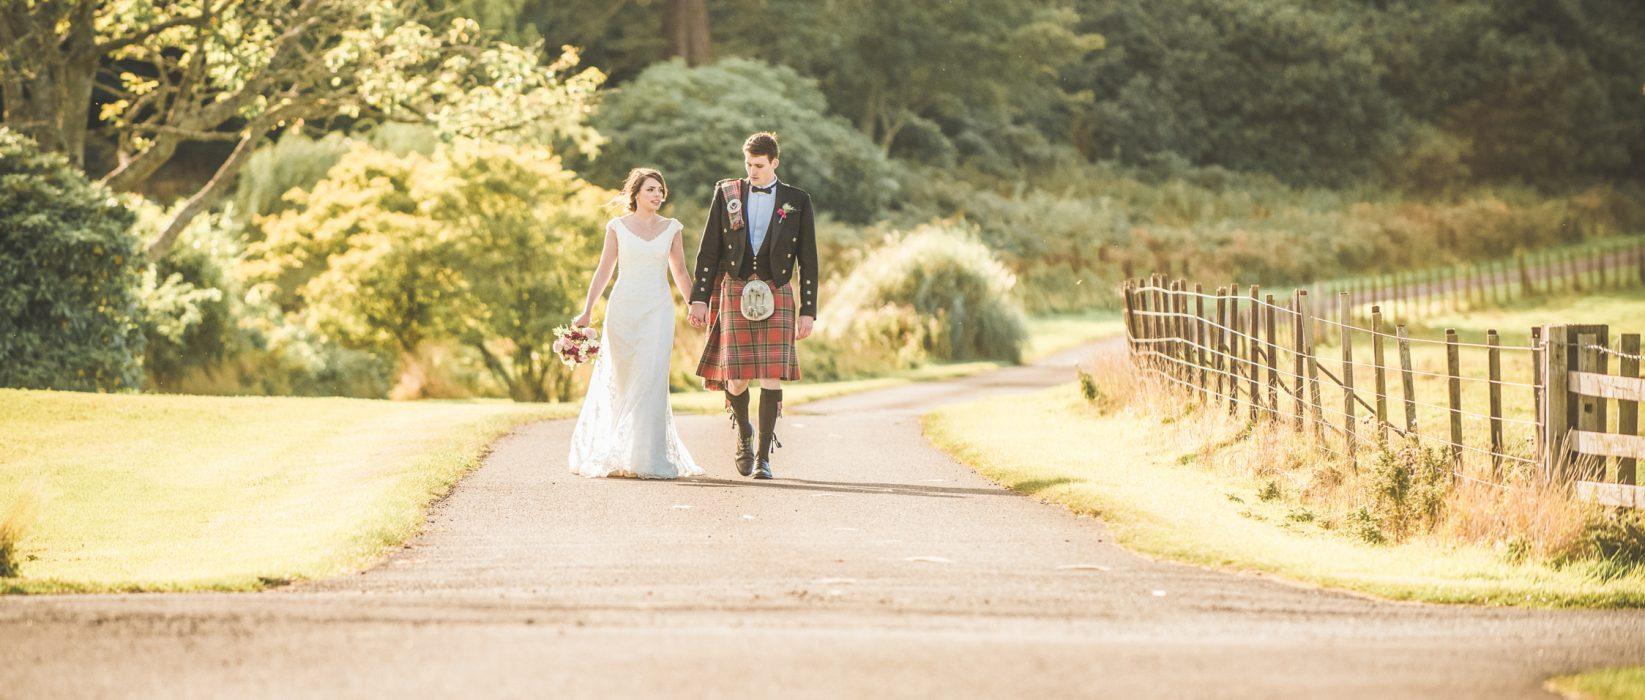 Wedding photography at Dunglass Estate